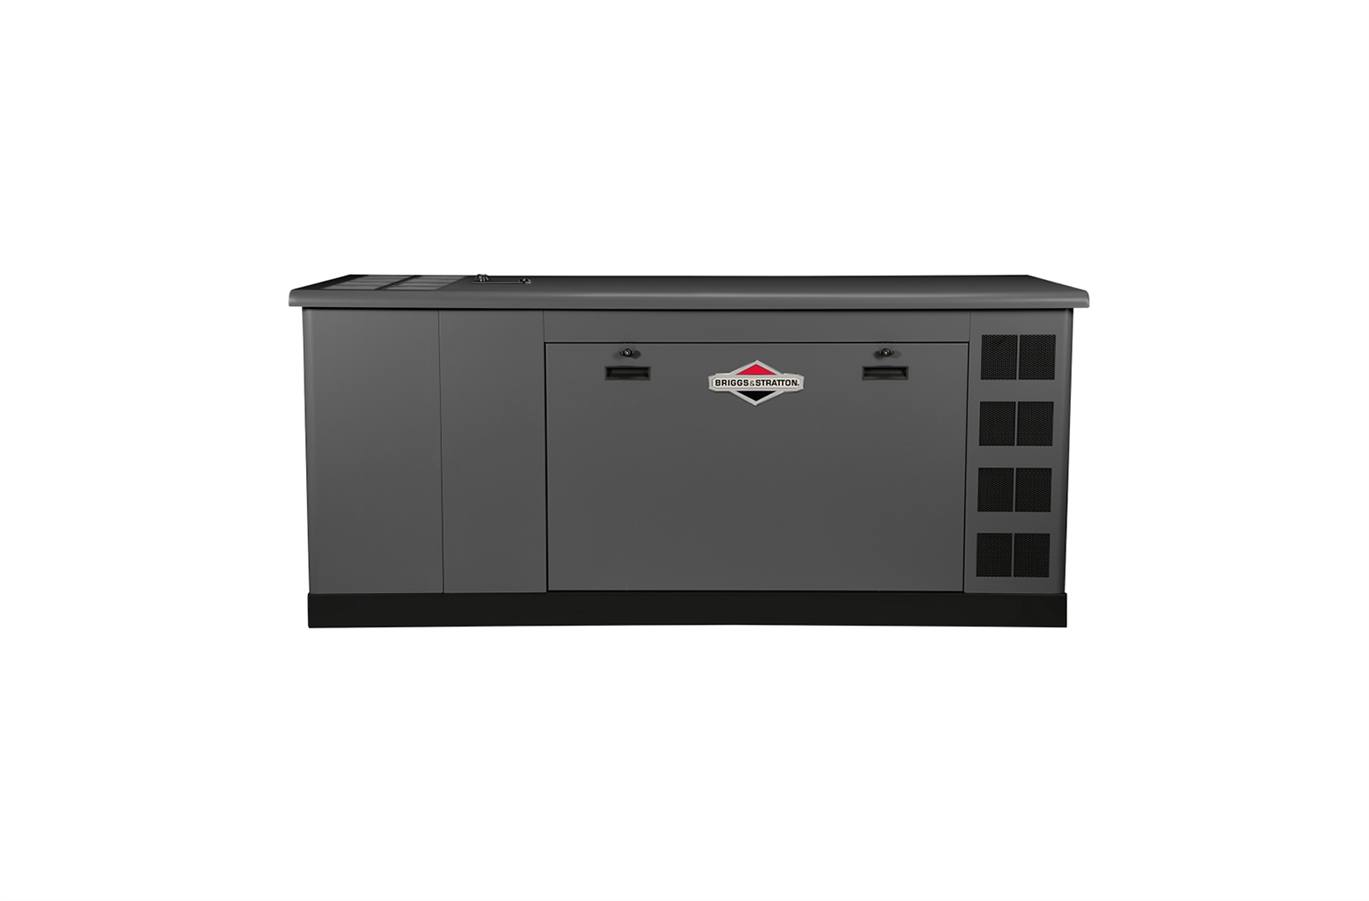 2019 Briggs & Stratton 48 kW1 Standby Generator System